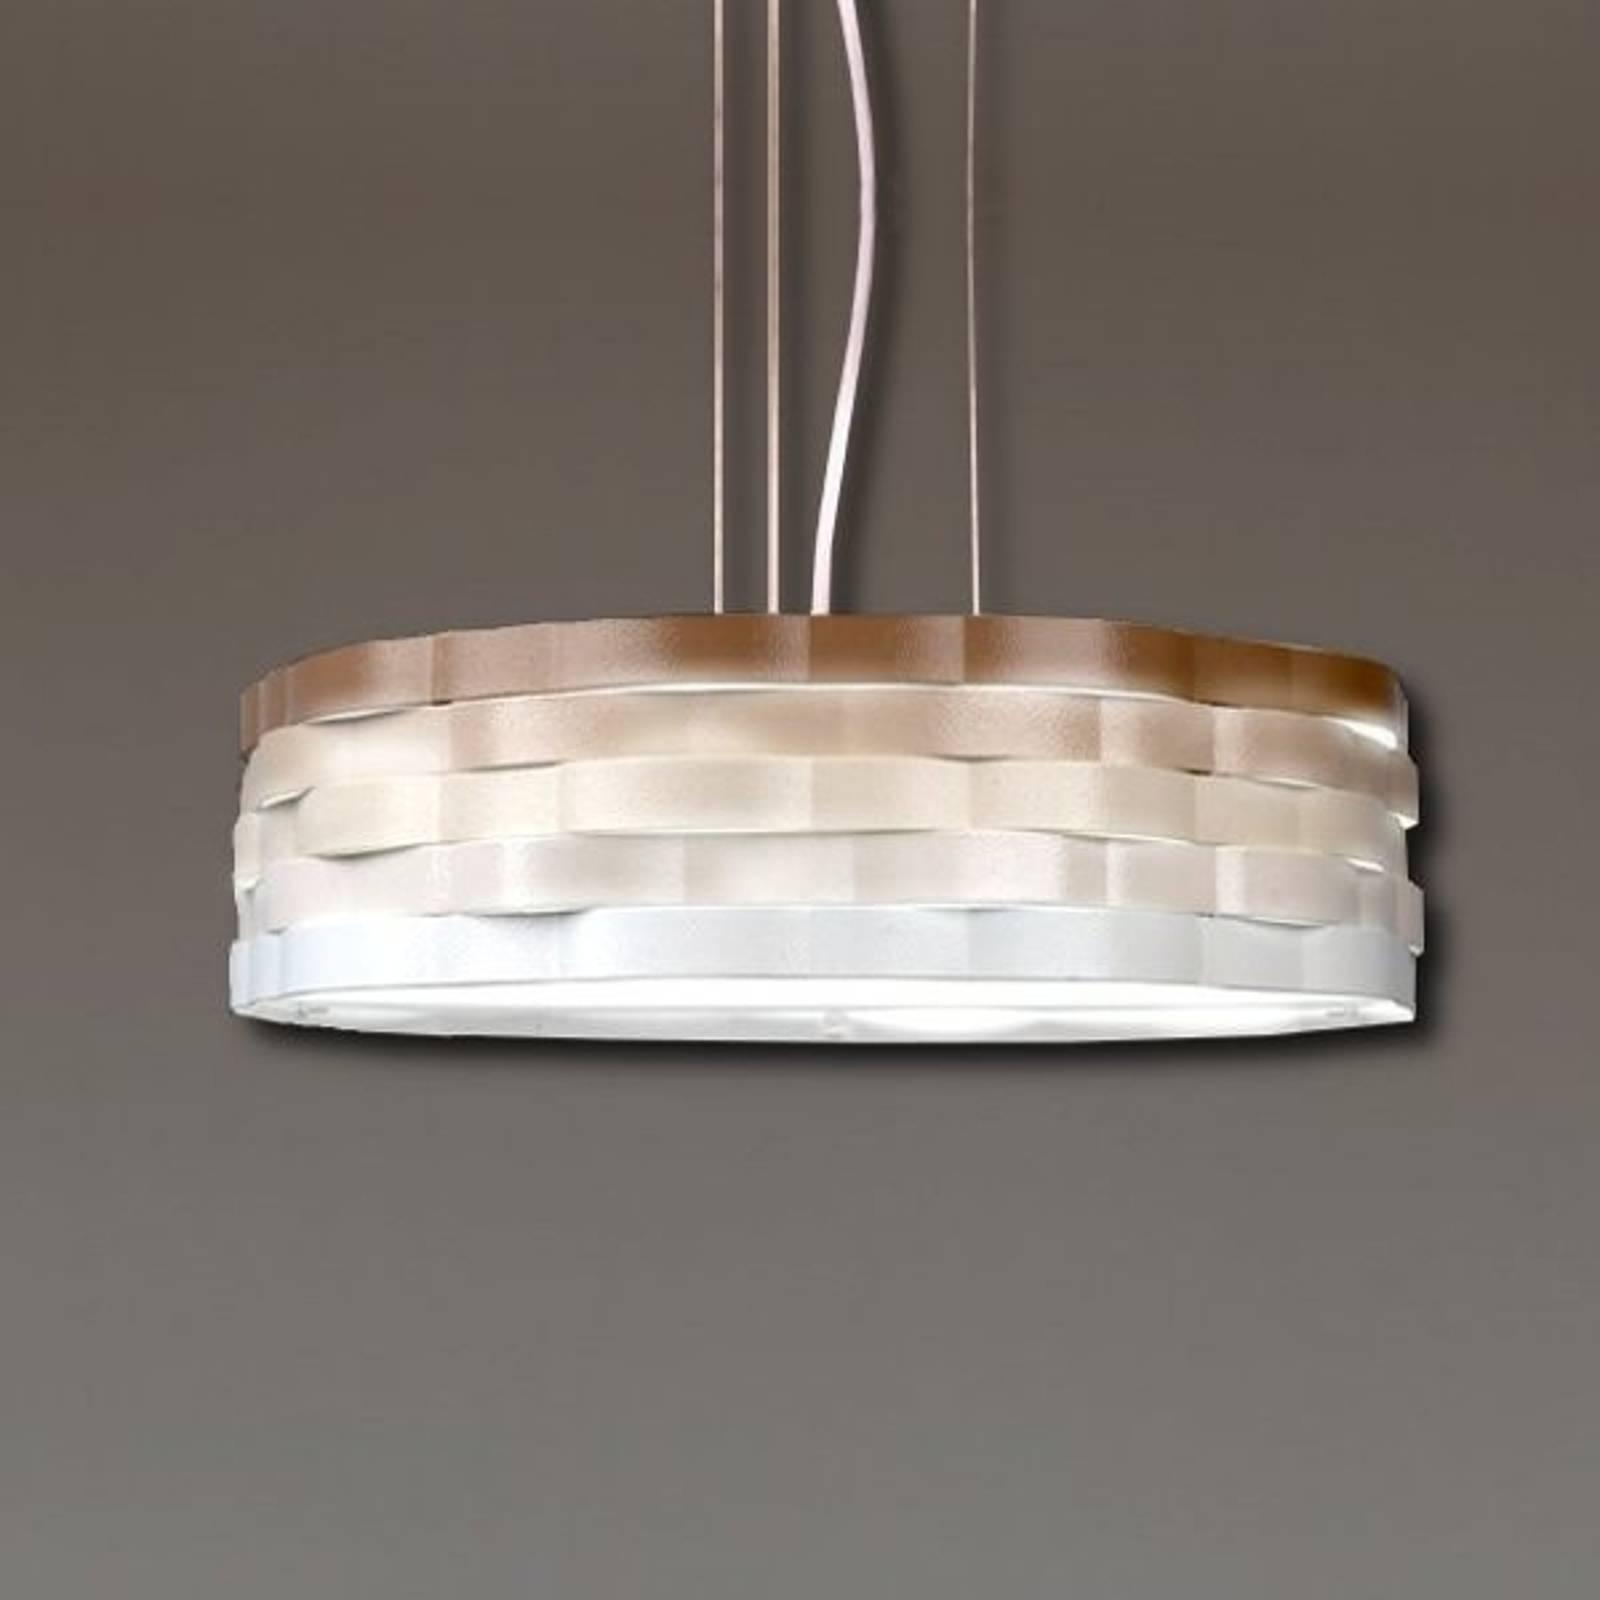 Flutti hanglamp met golvende kap, crème